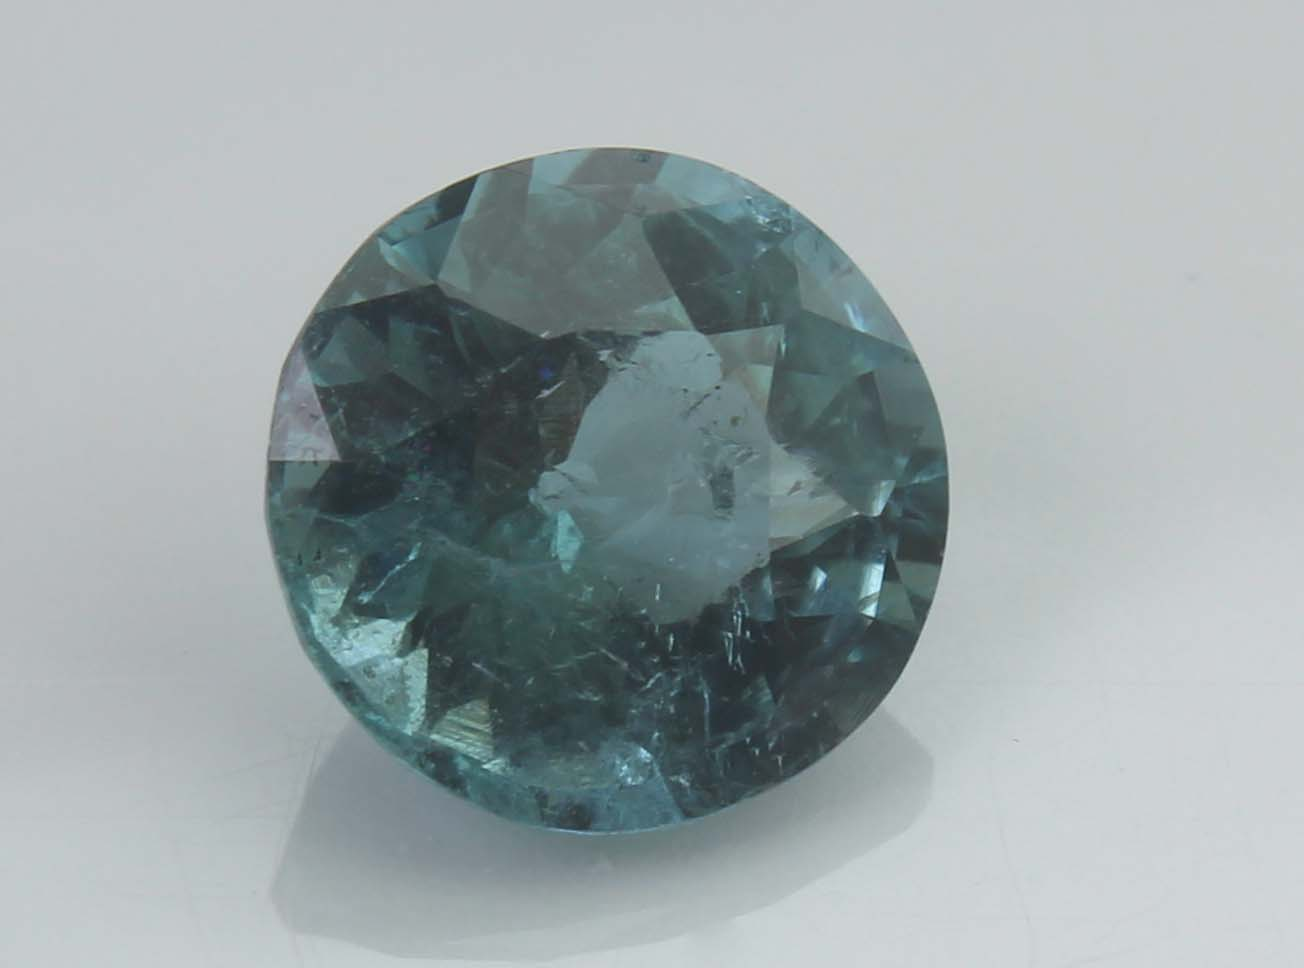 Blue Tourmaline, 2.37 Ct - Image 3 of 5